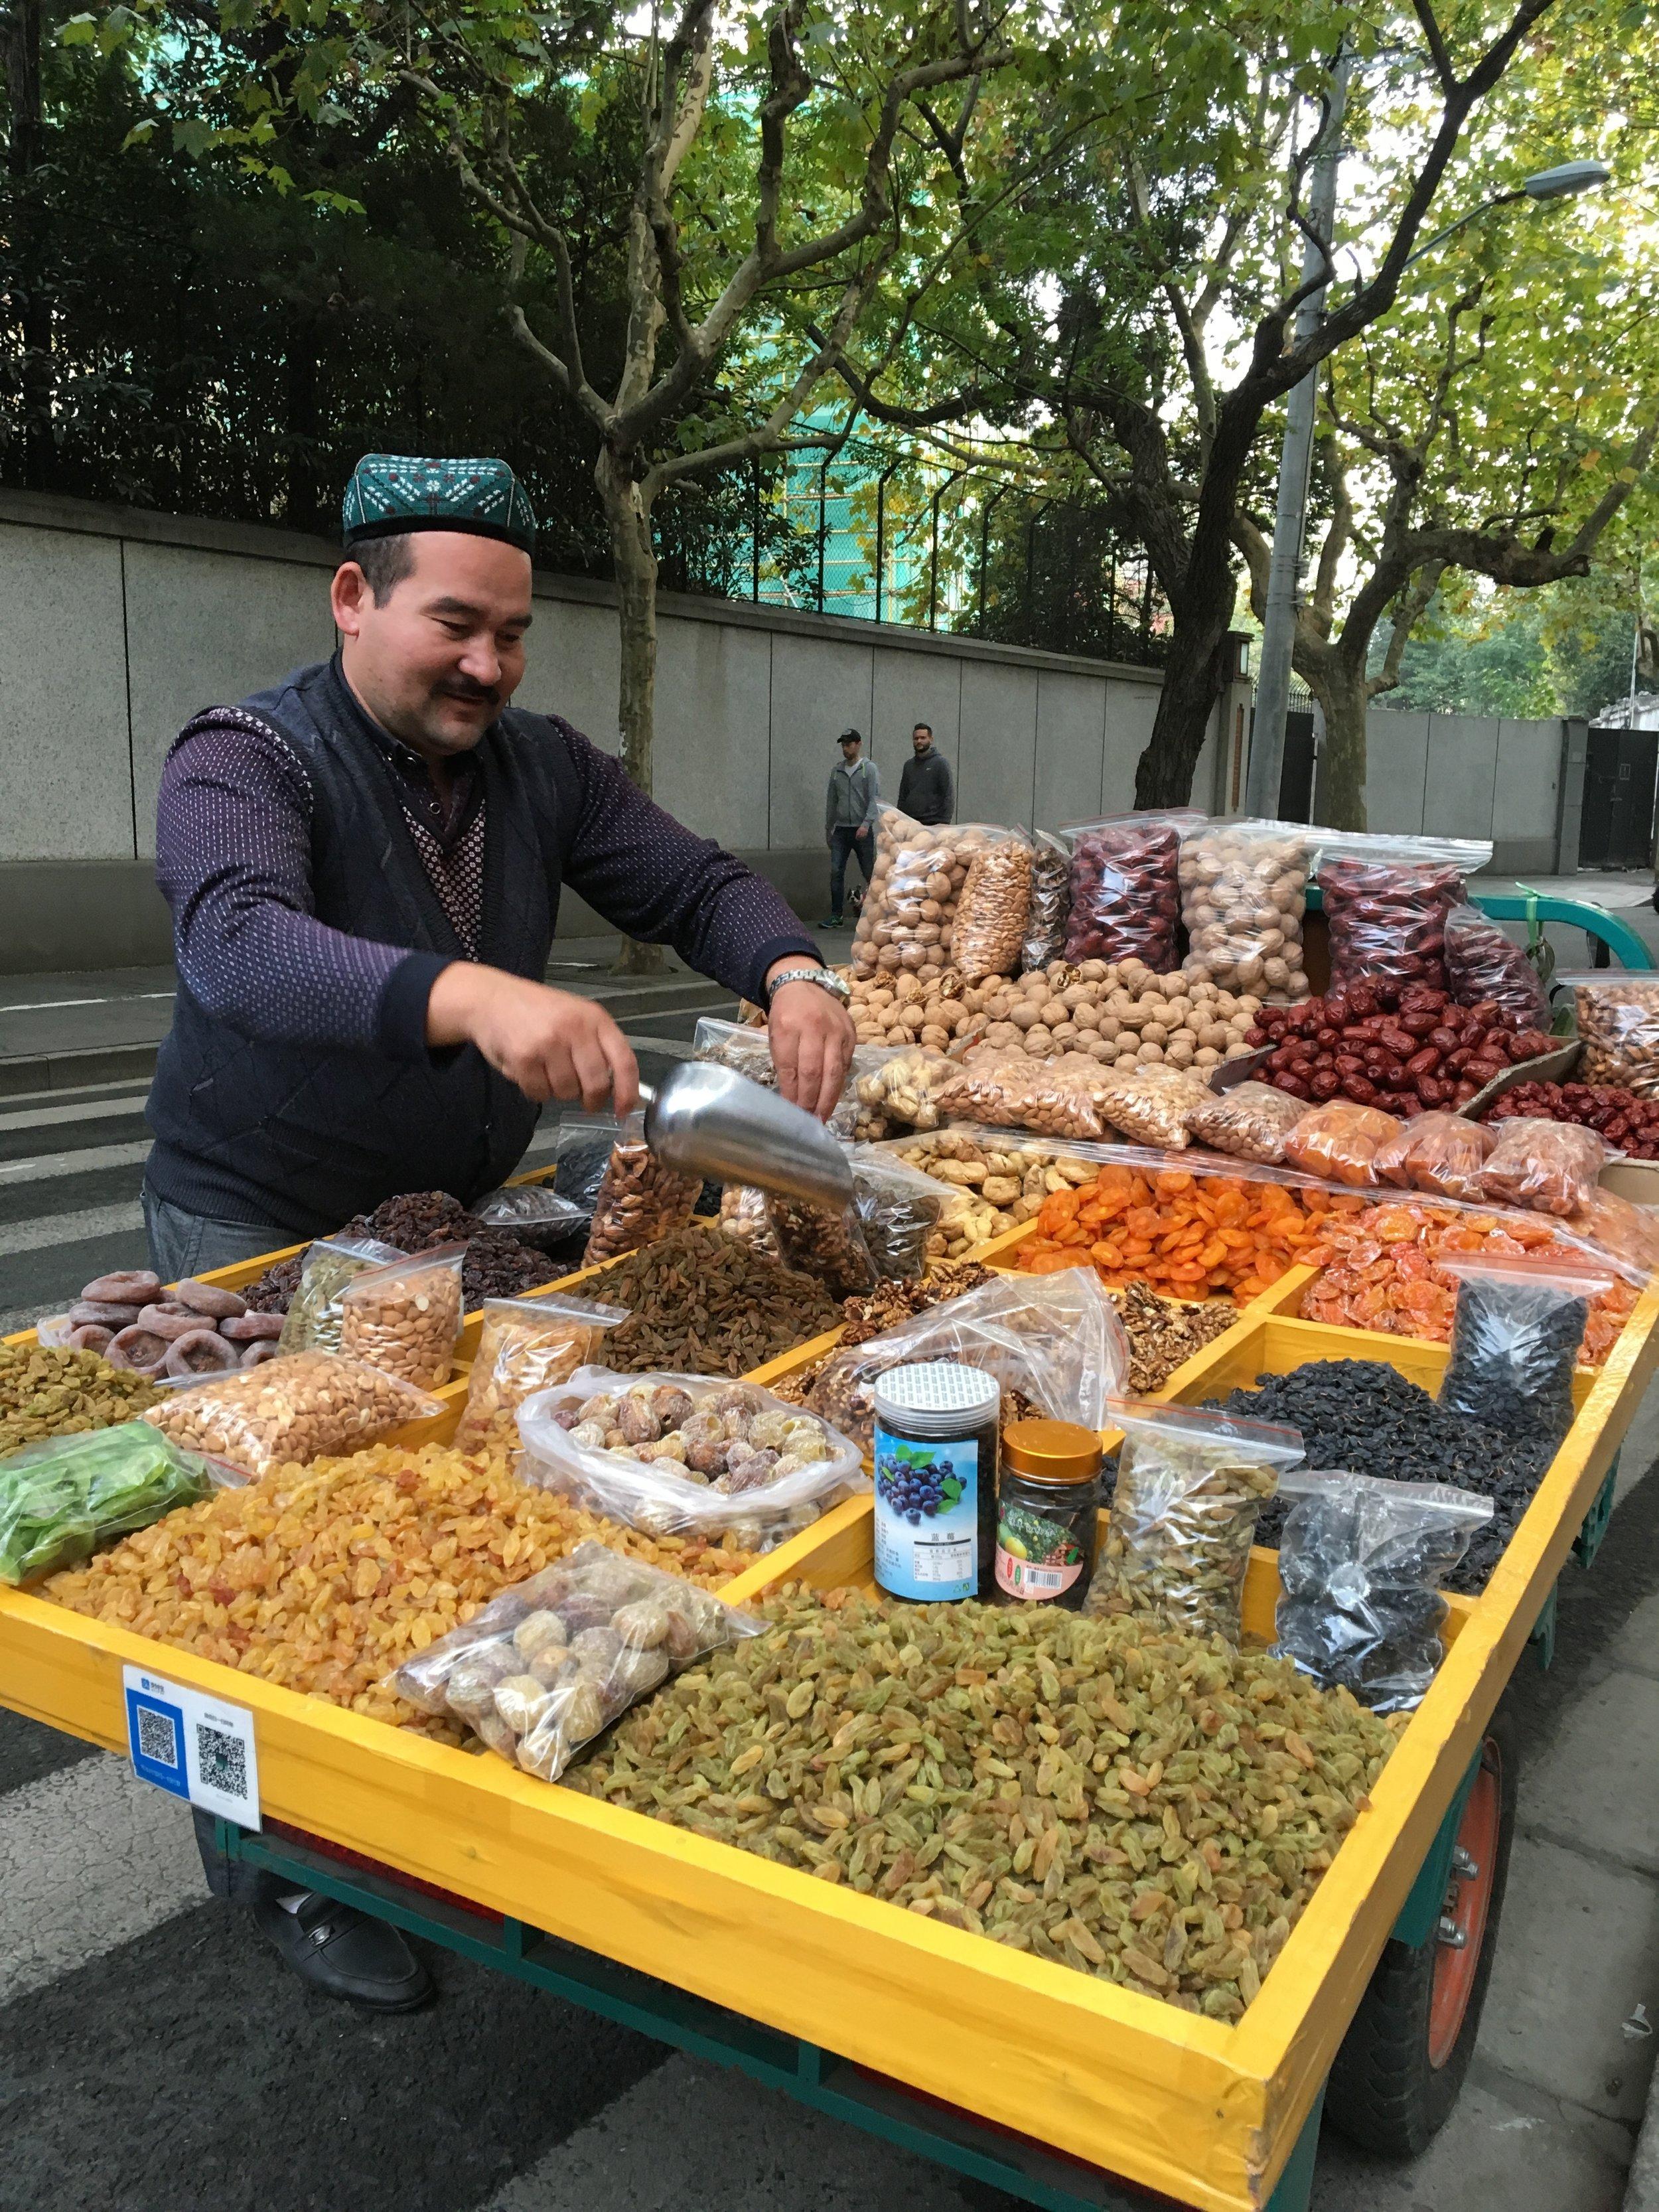 A Street Vendor from Xinjiang